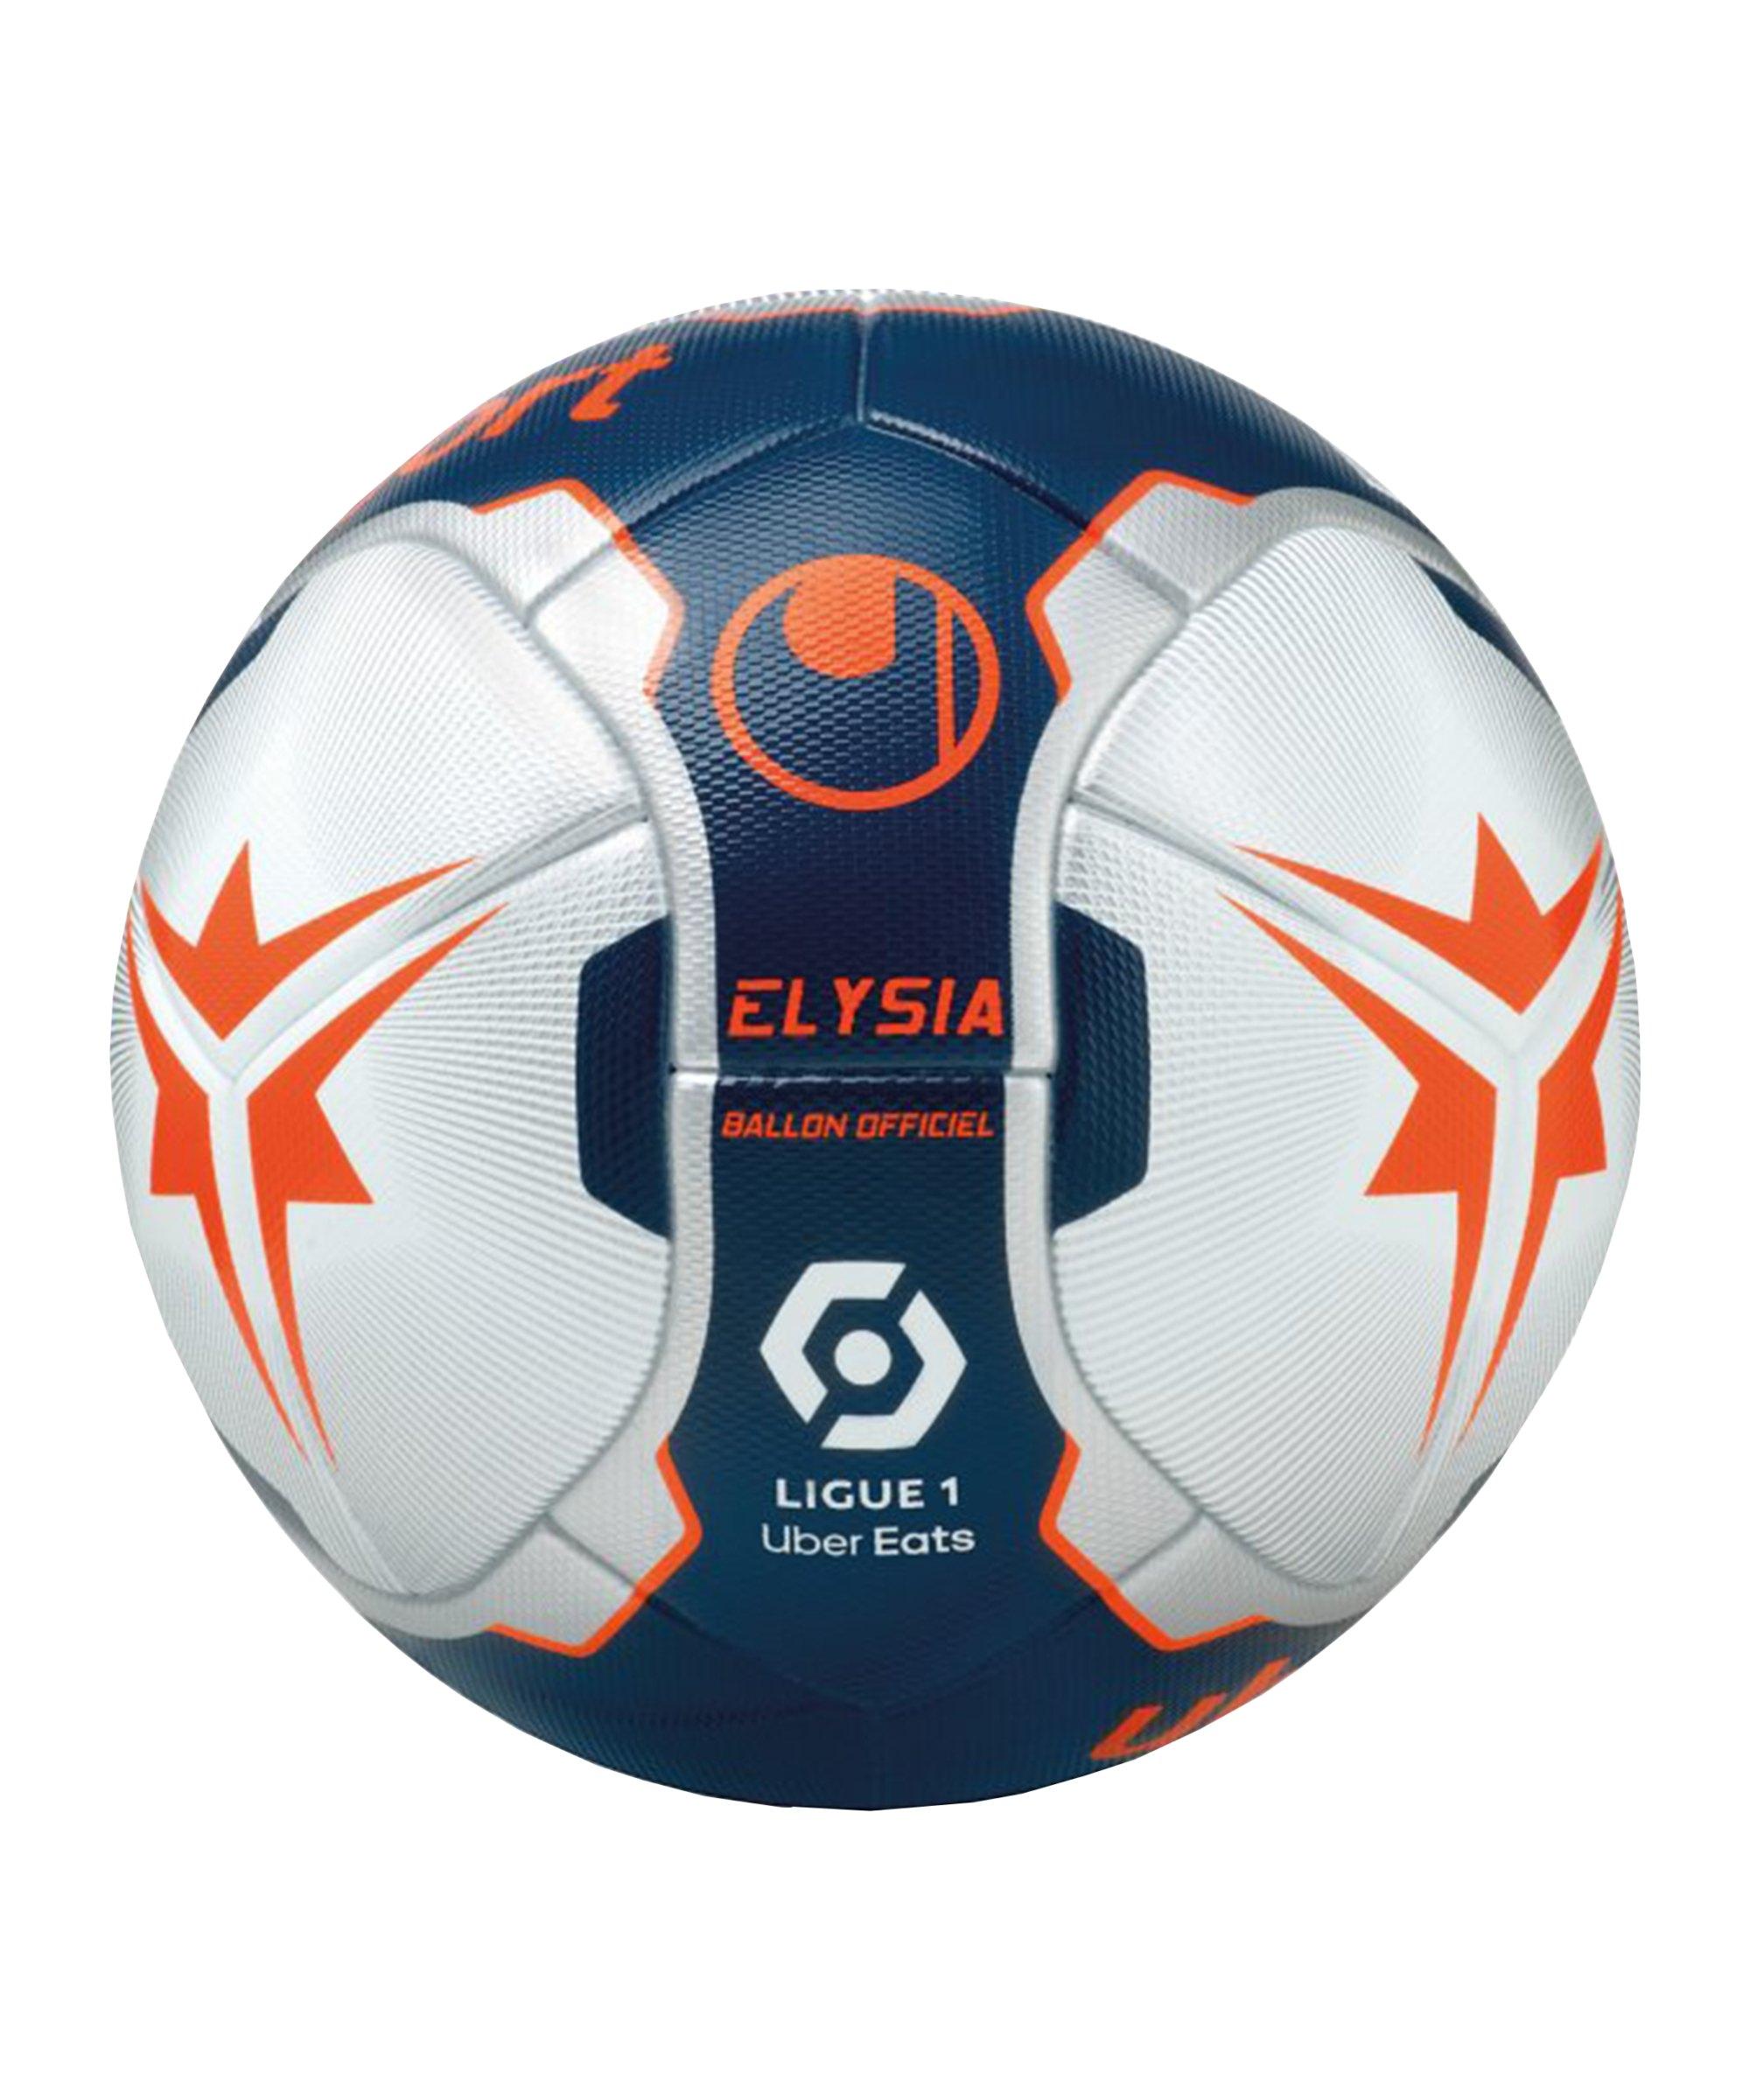 Uhlsport Elysia Ballon Officiel Spielball Blau - blau